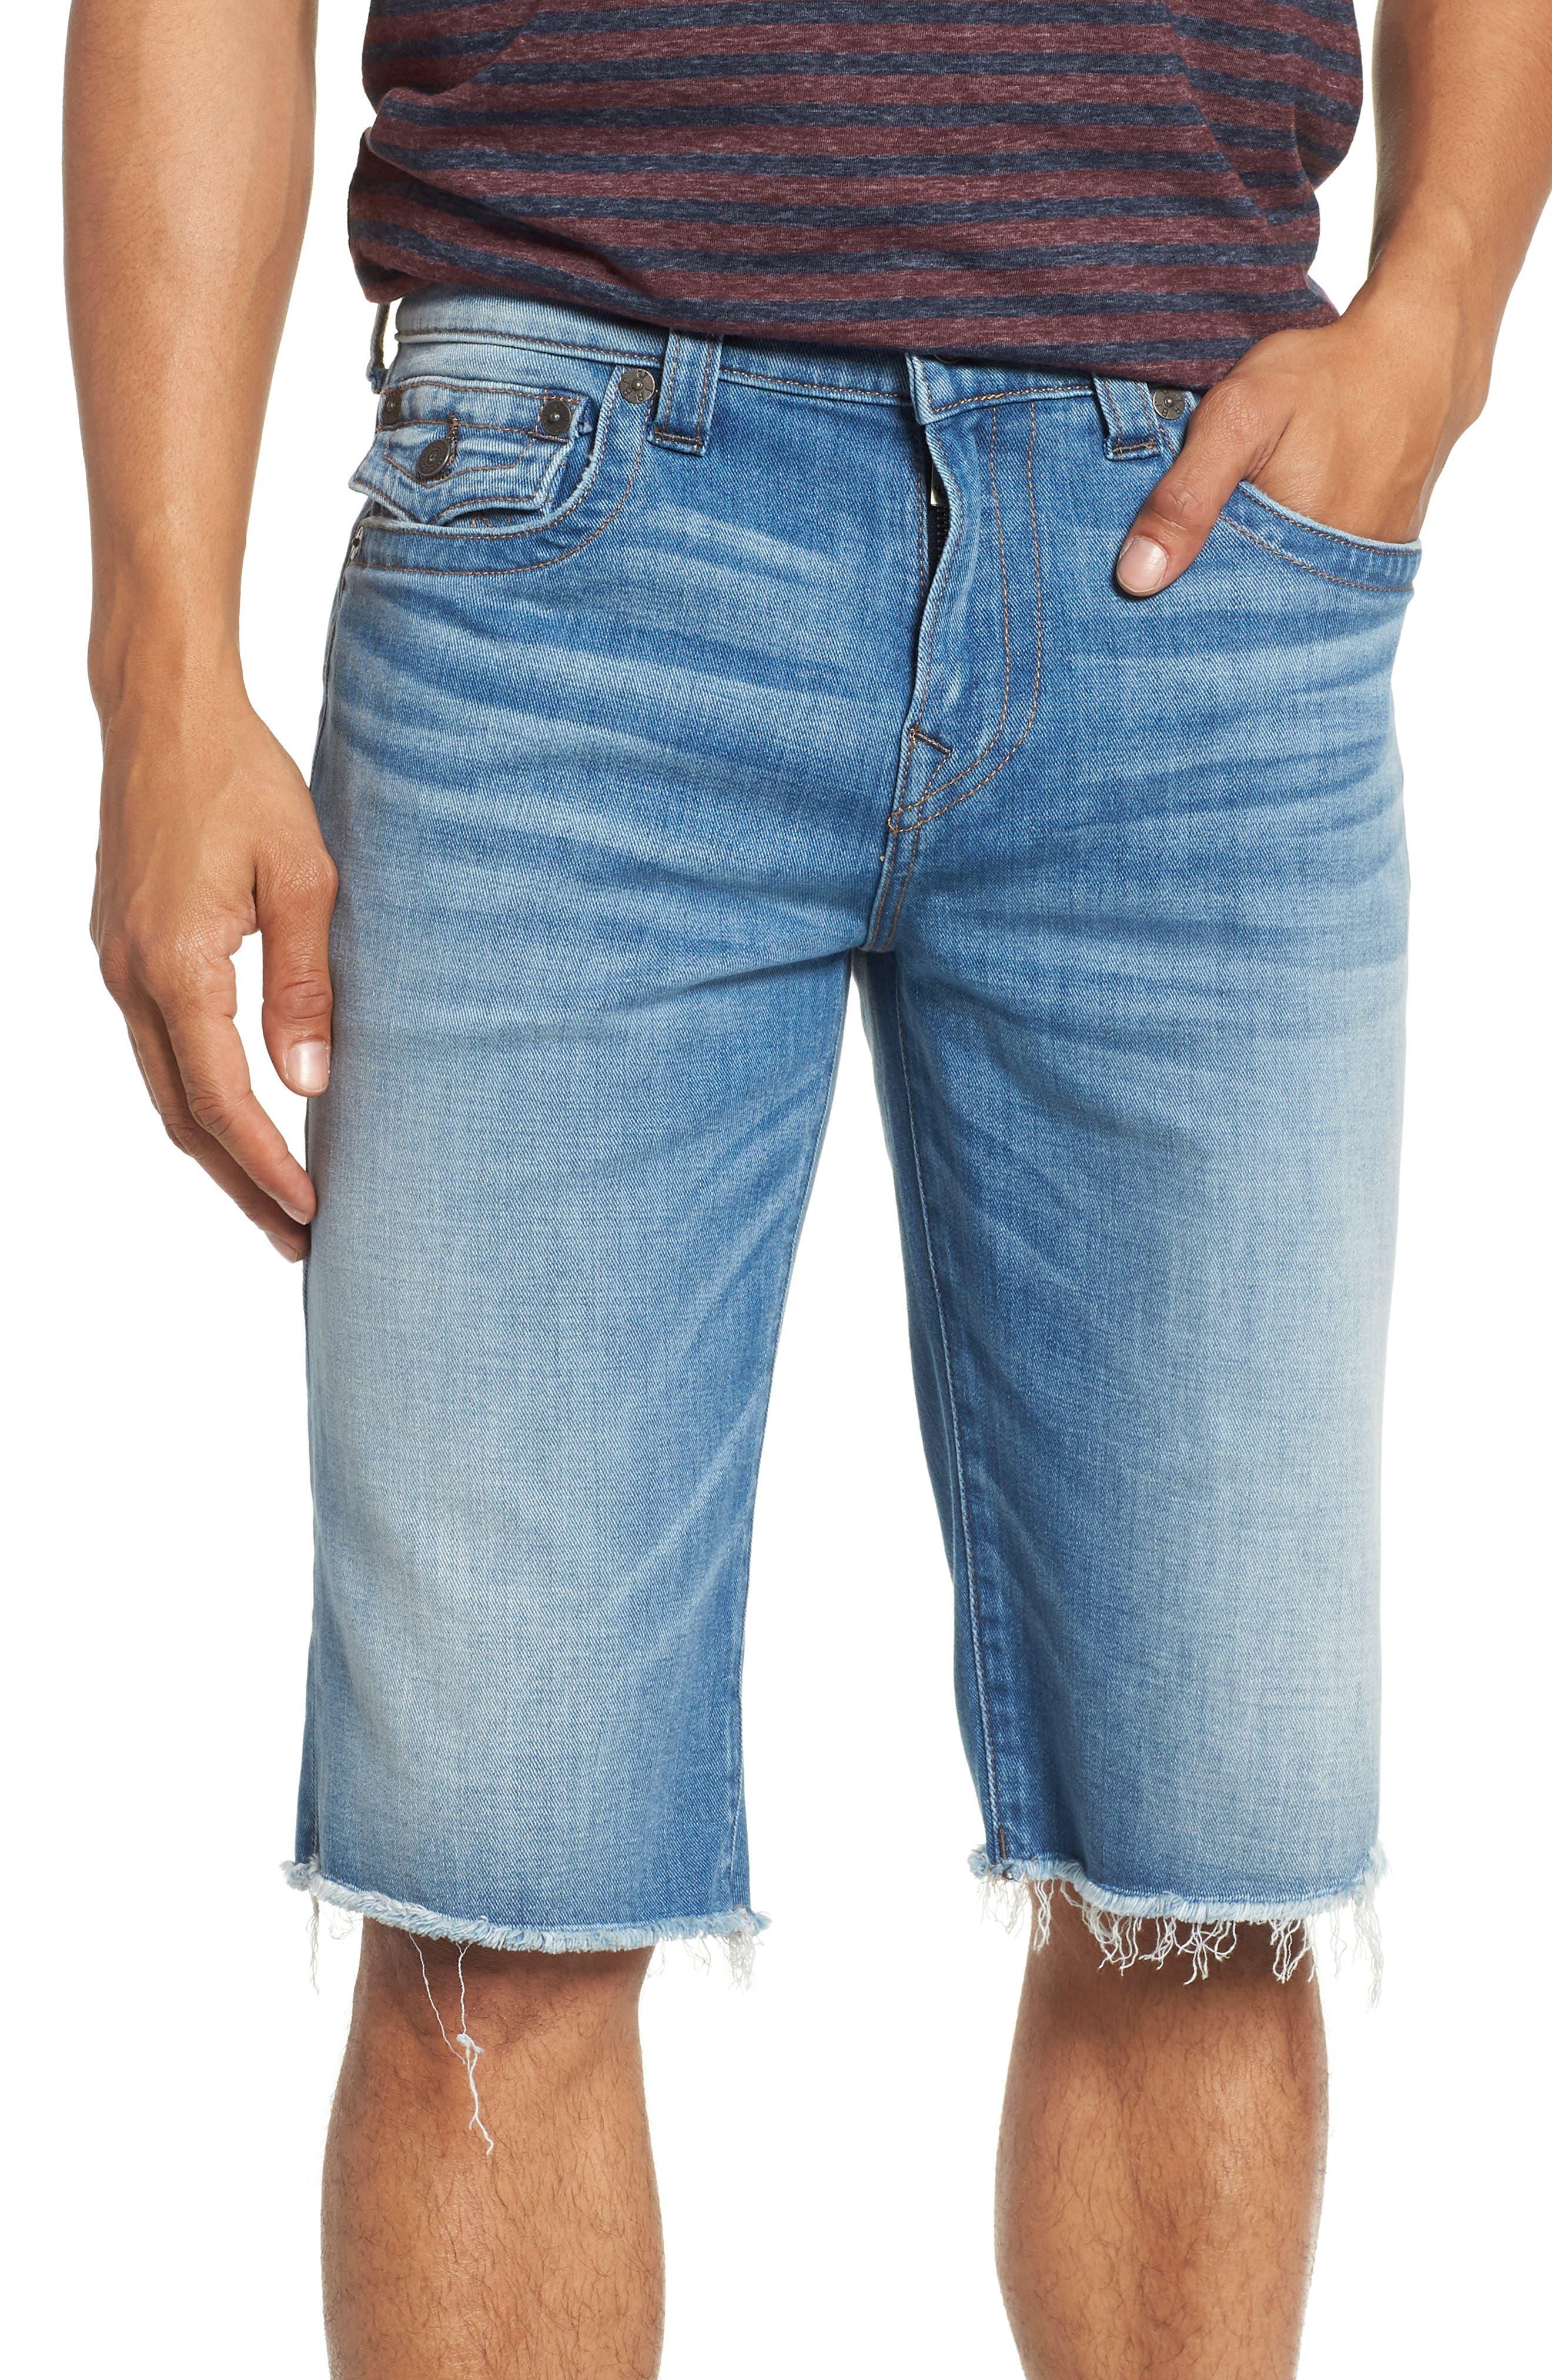 Alternate Image 1 Selected - True Religion Brand Jeans Ricky Flap Pocket Shorts